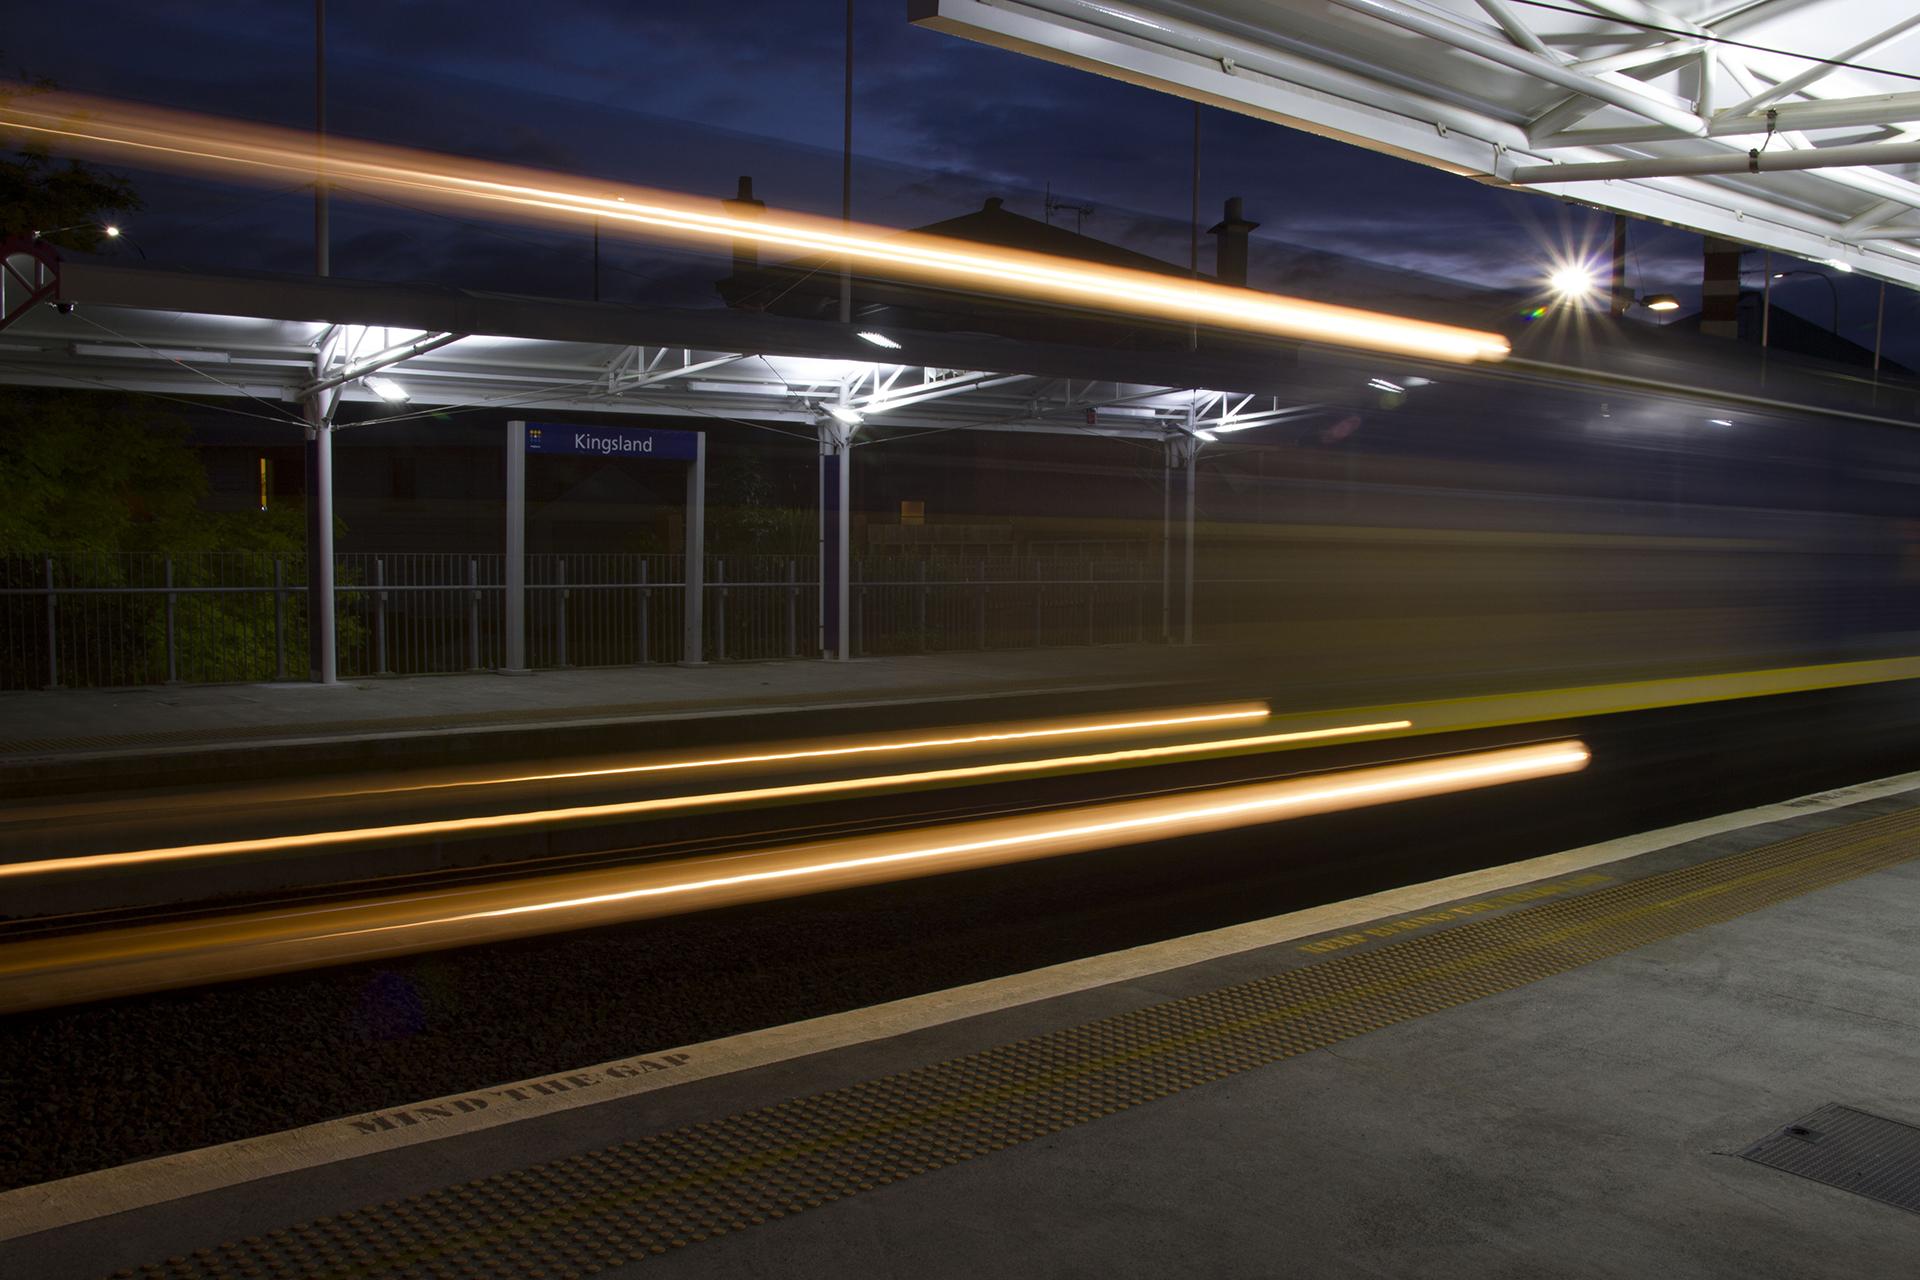 Kingsland Train Station